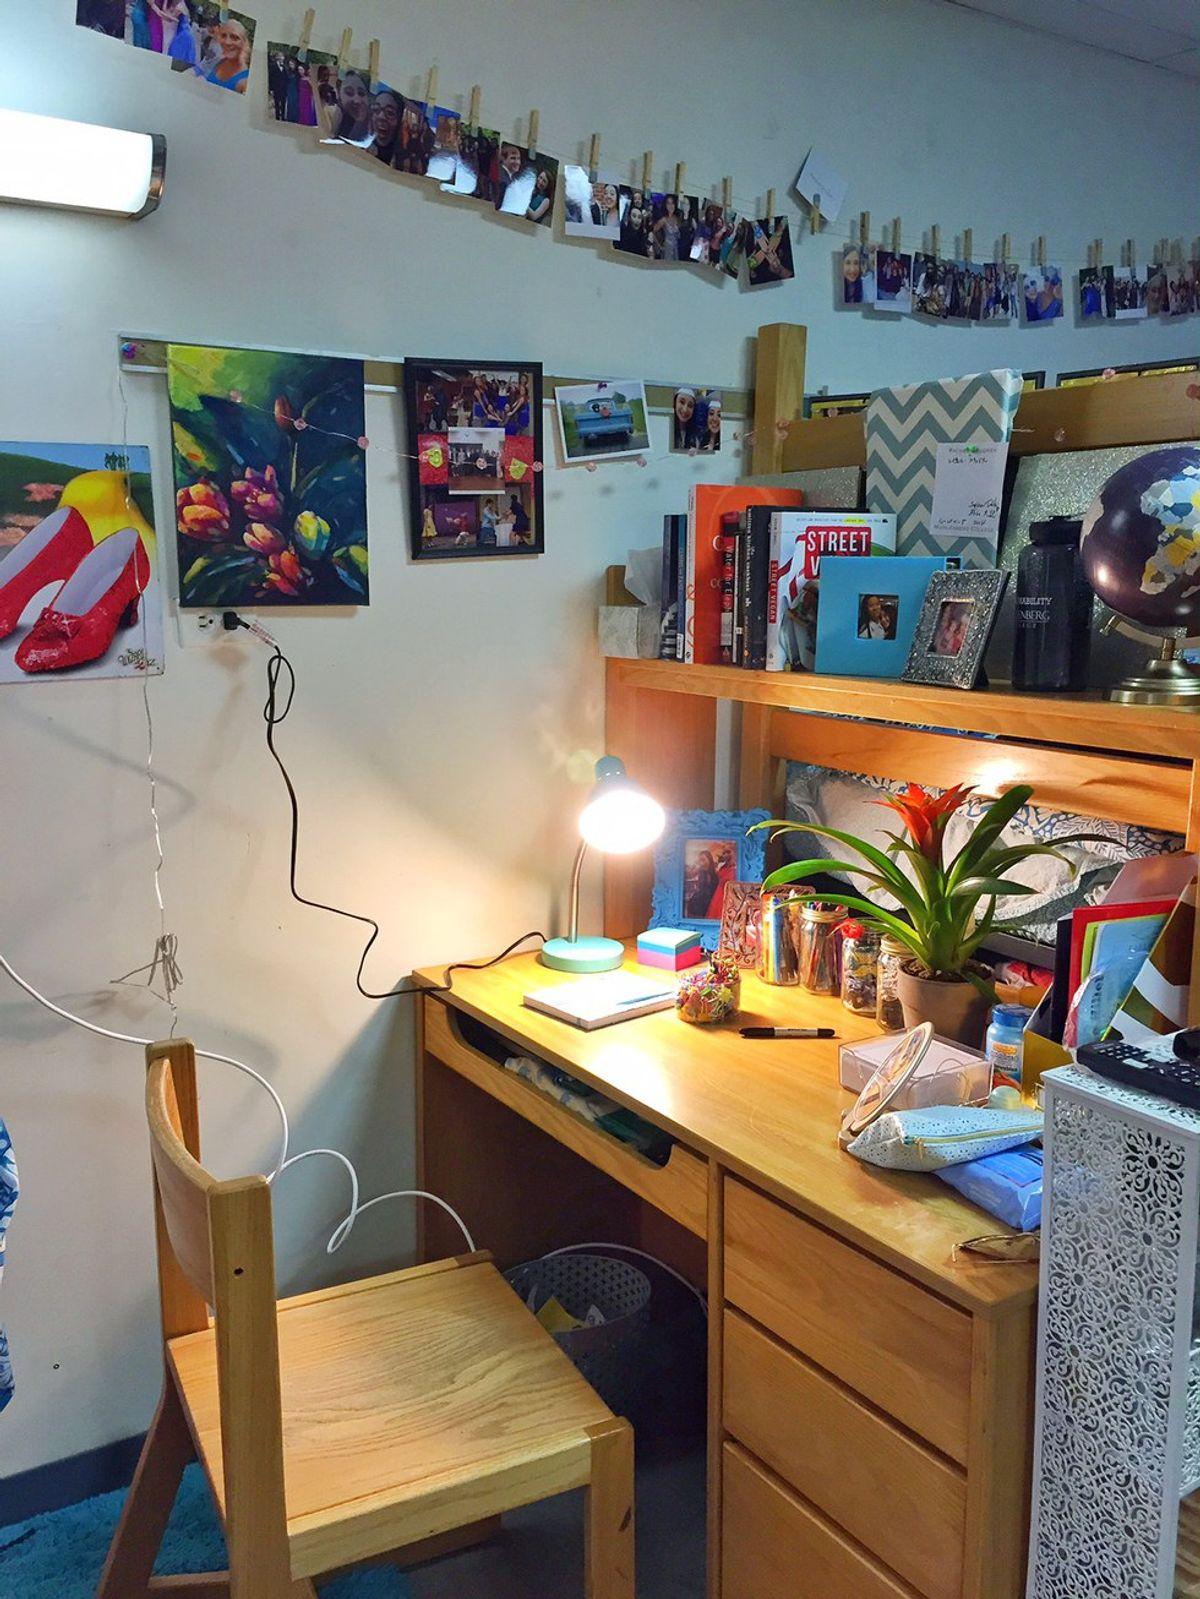 The Ultimate College Dorm Guide